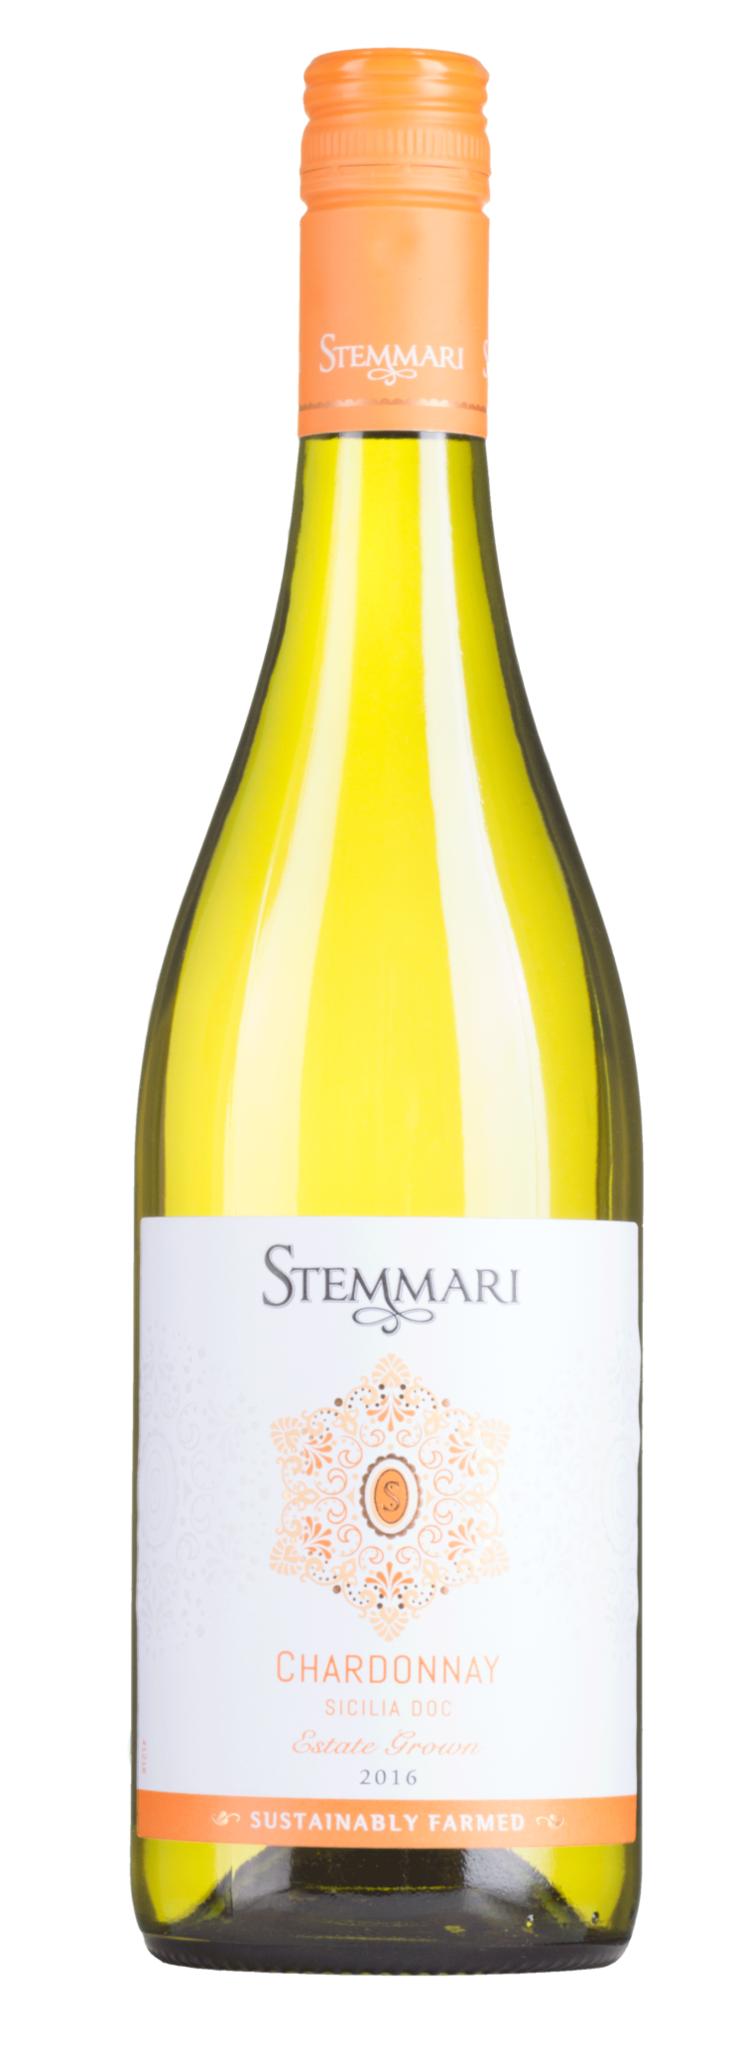 Stemmari /Feudo Arancio), Sizilien 2019 Chardonnay Sicilia DOC Stemmari